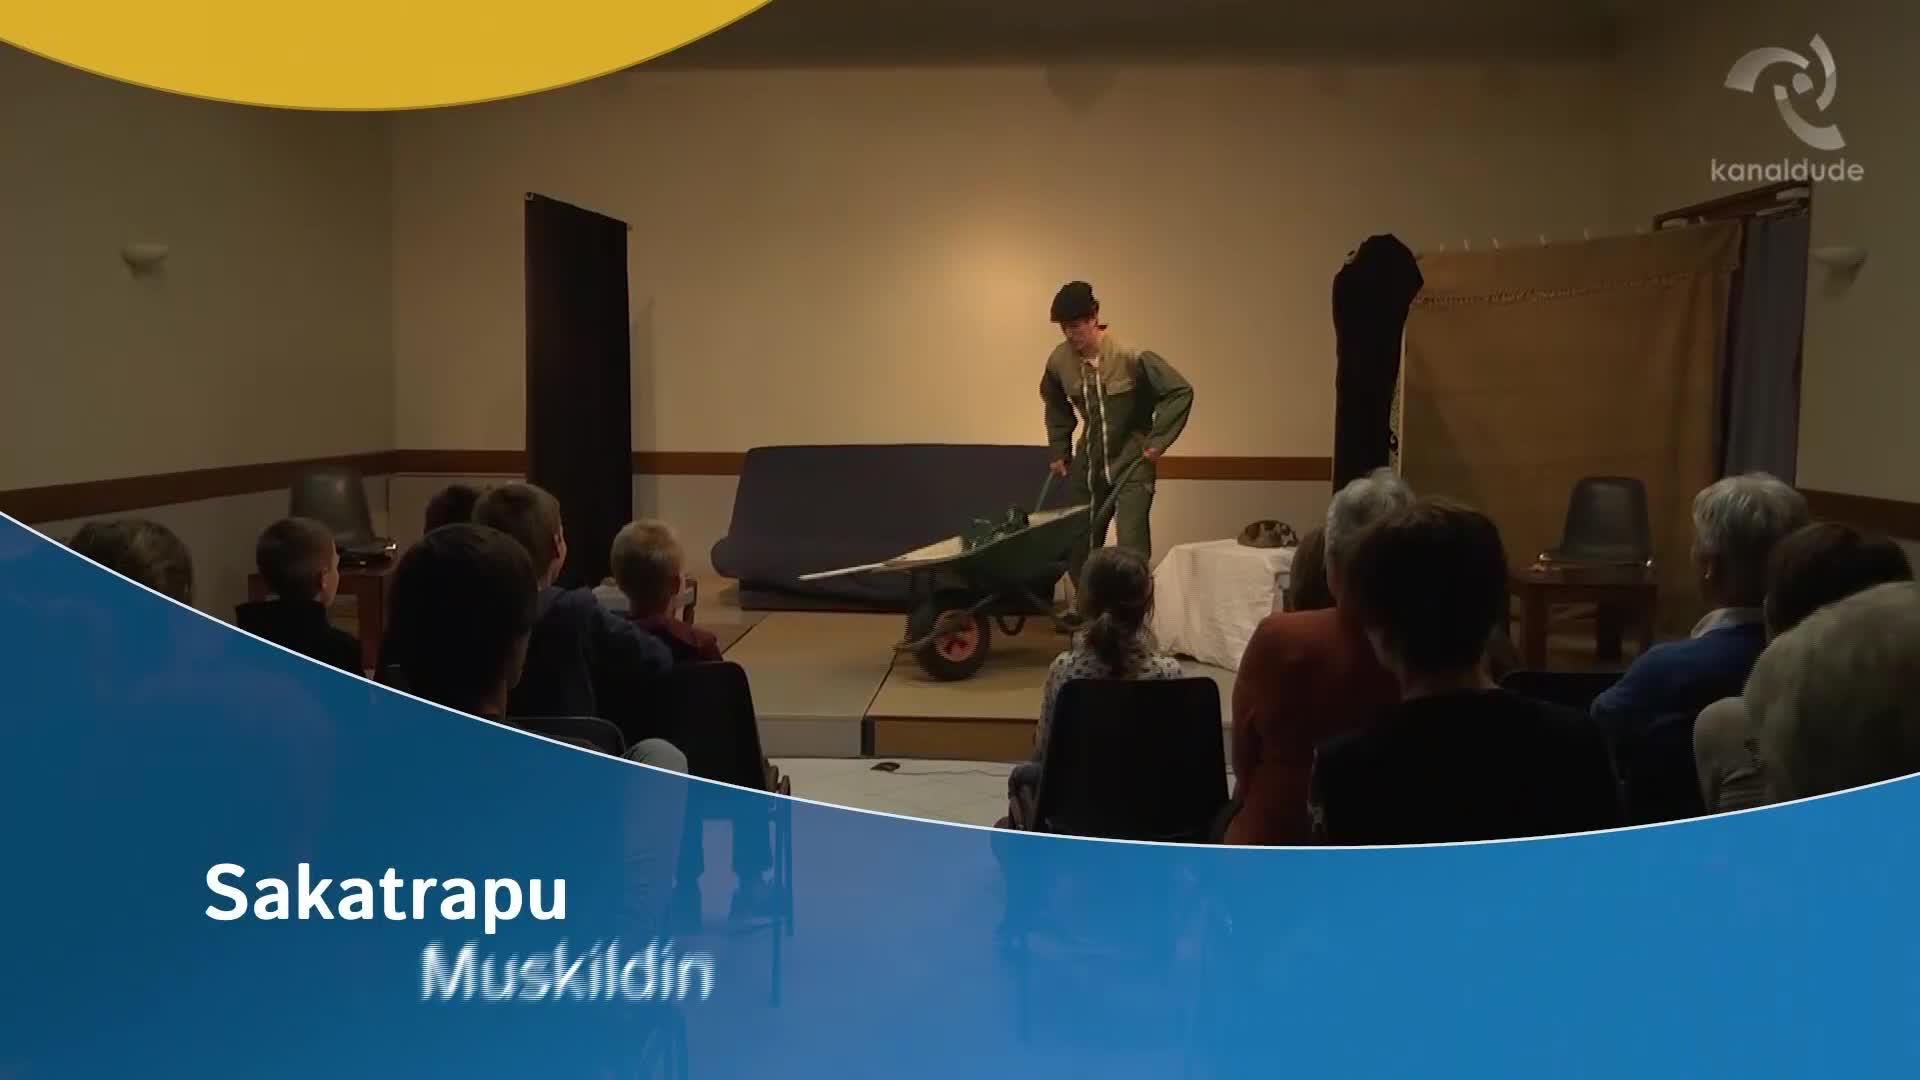 Sakatrapu Muskildin